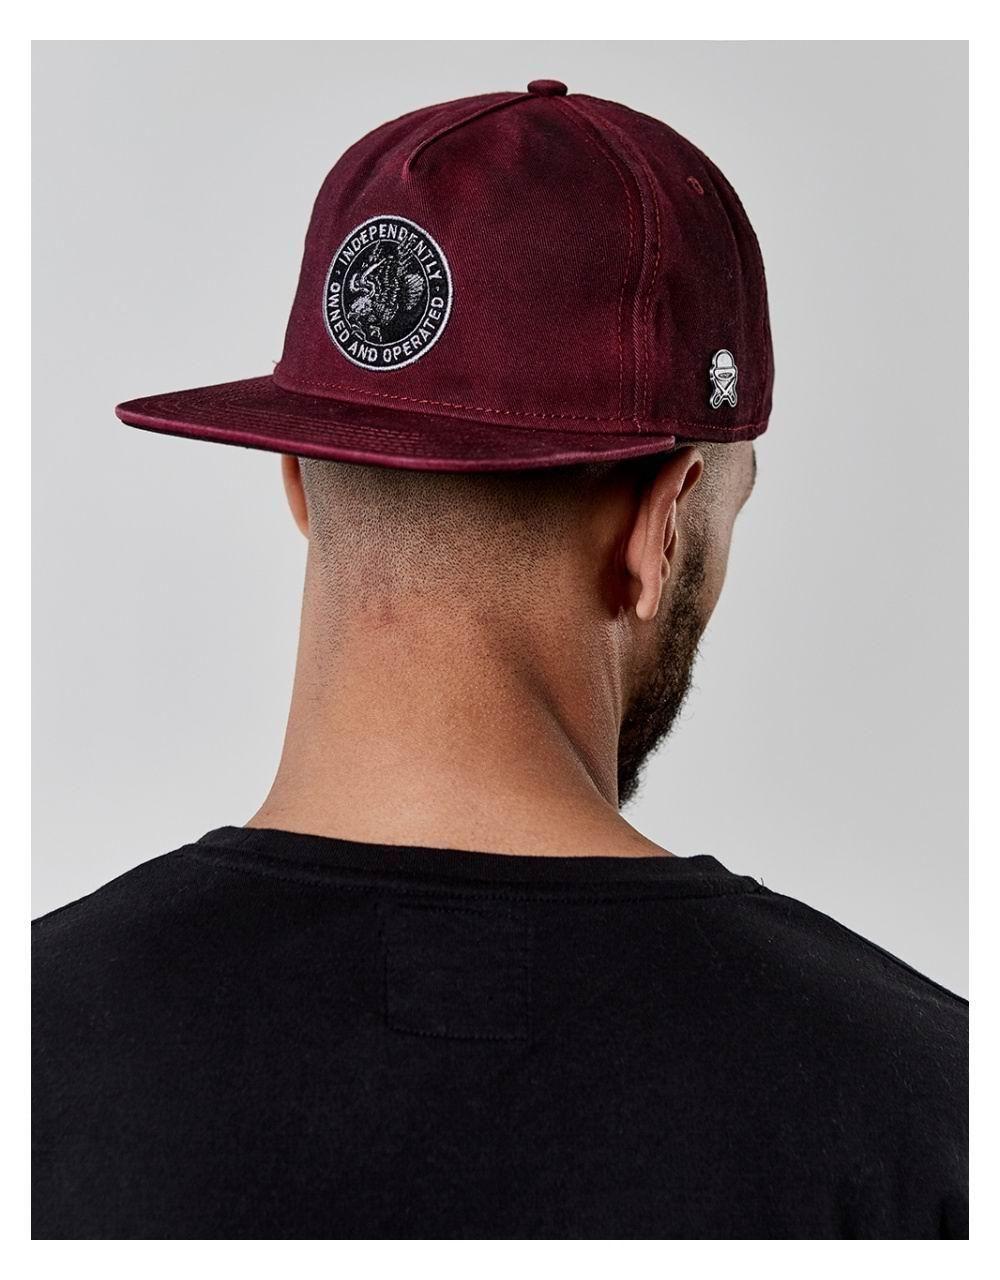 49866fee83a Classic Design Snapback Cap Men Fashion Baseball Cap Rock AND Roll Heavy  Metal Superstar Hats Old Skool Snapback Hats Online Cap Online From  Zll8399